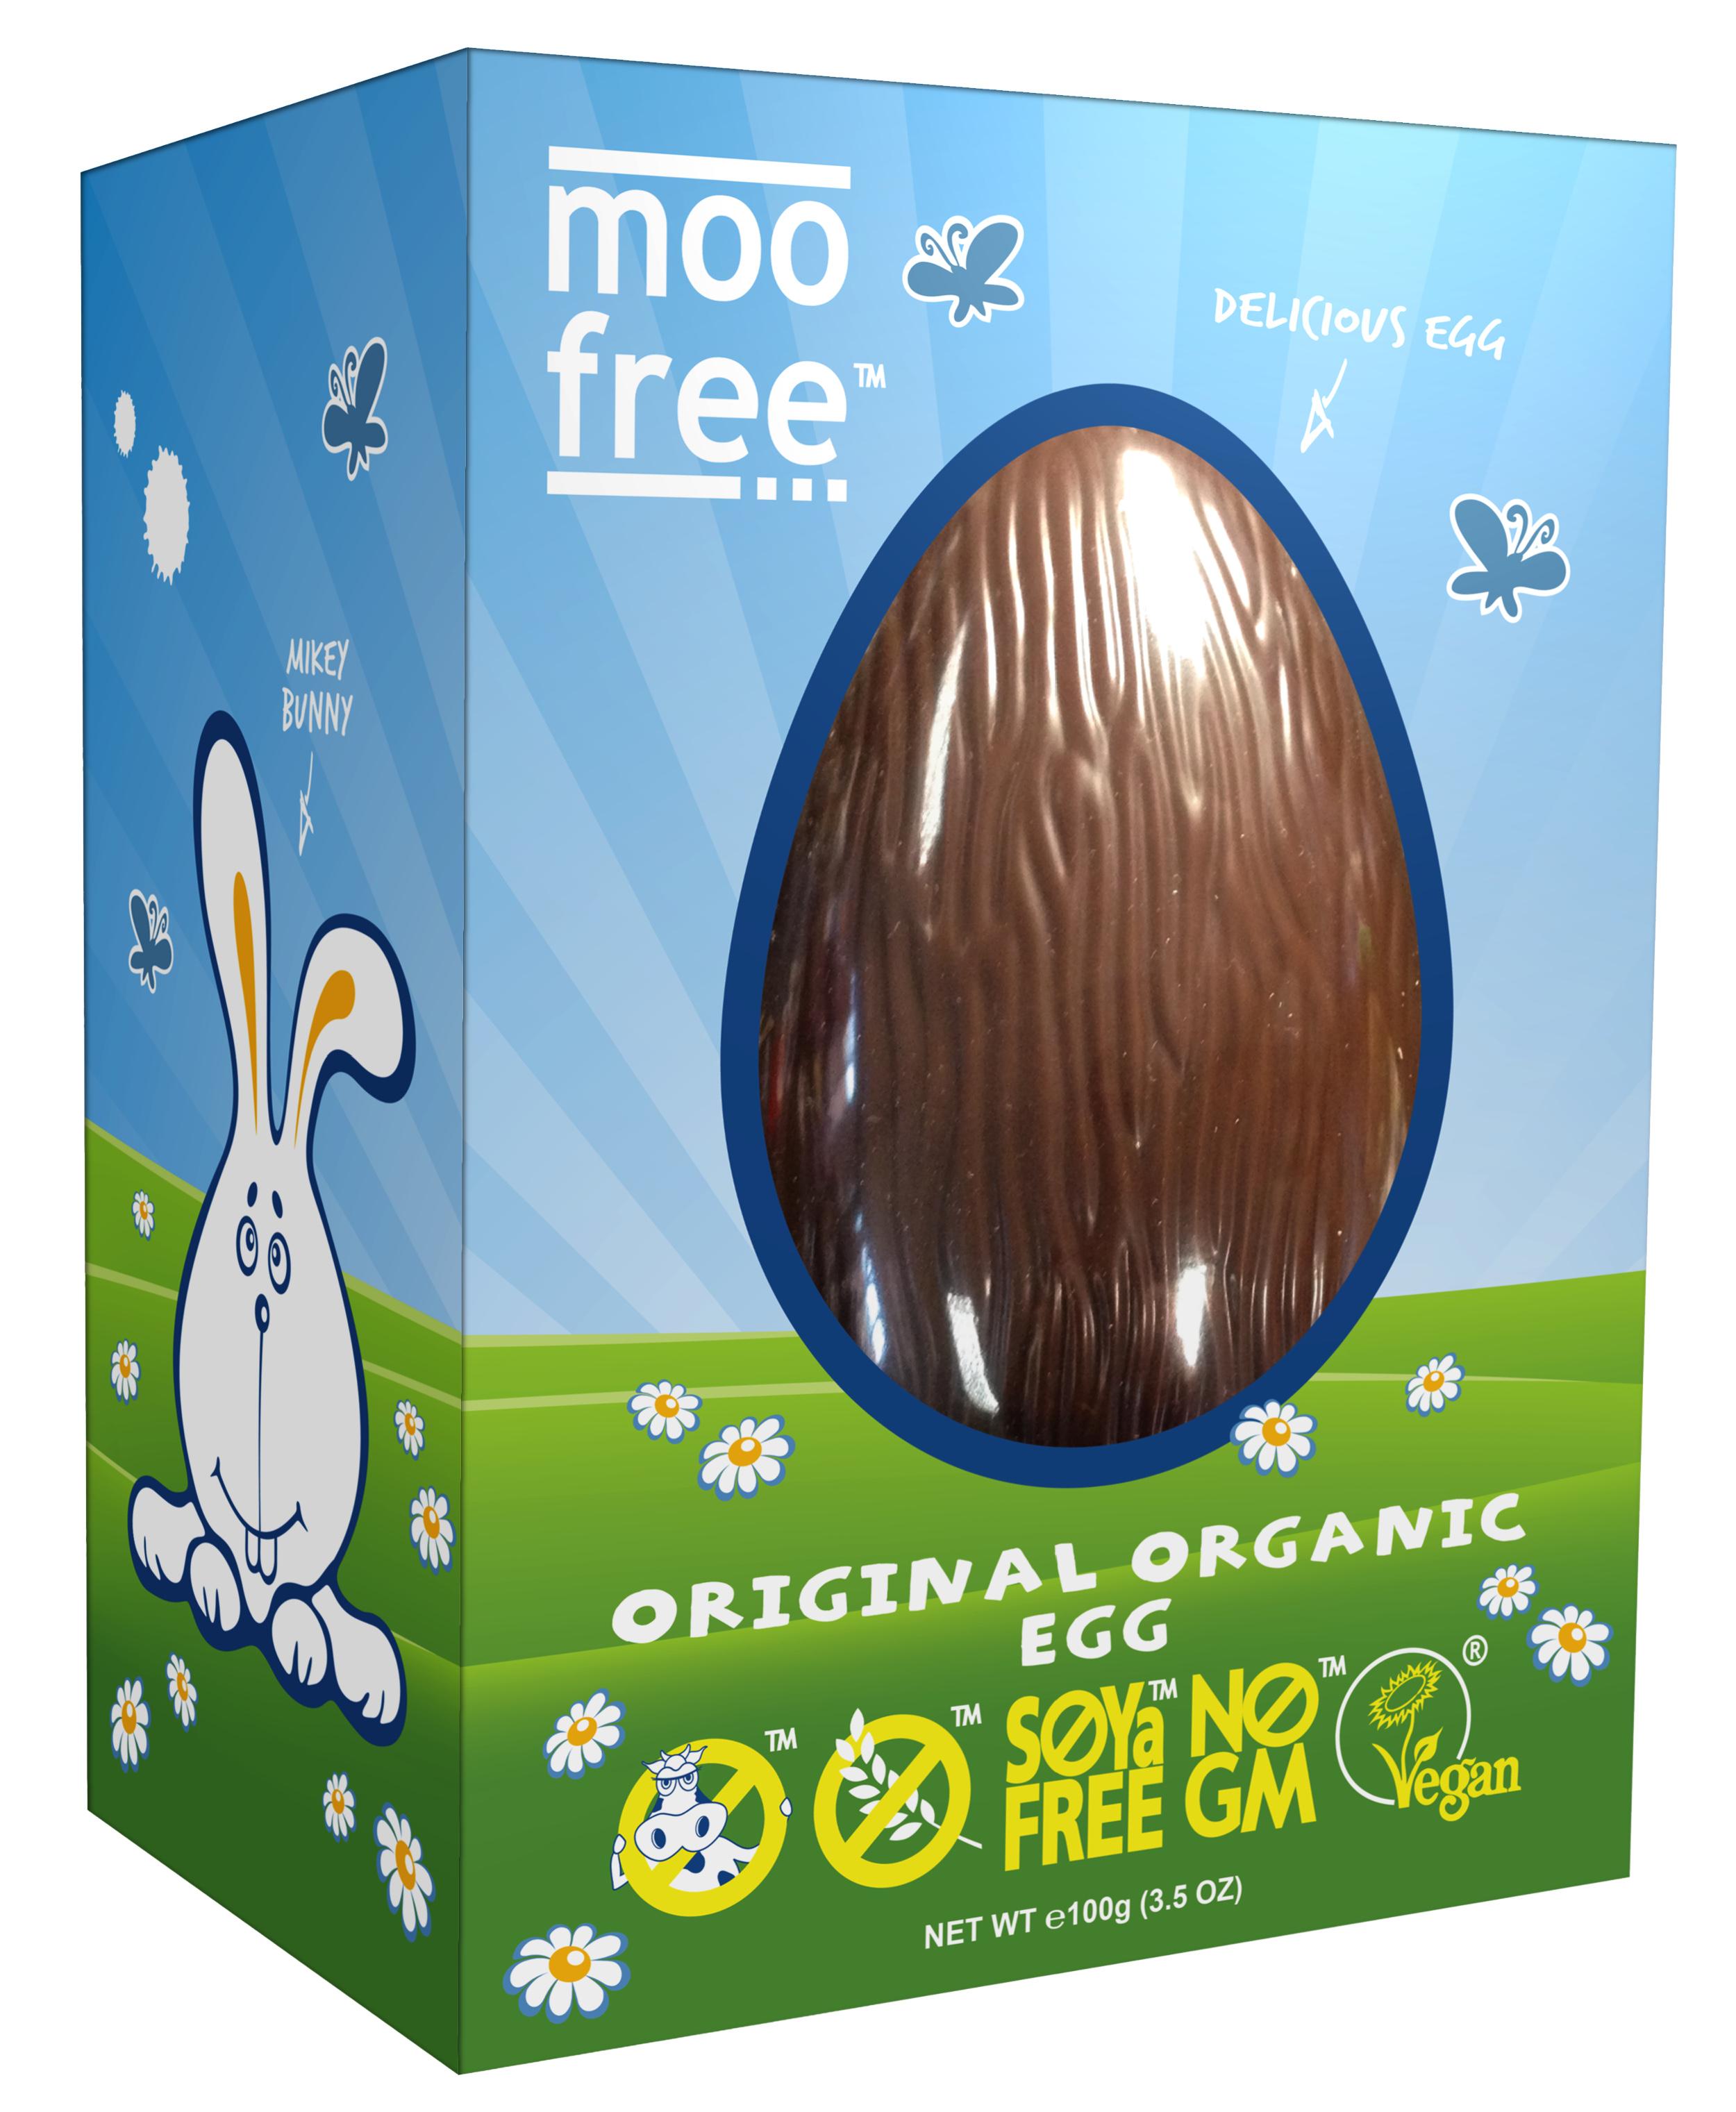 moo-free-easter-egg-1-egg-hi-res.jpg